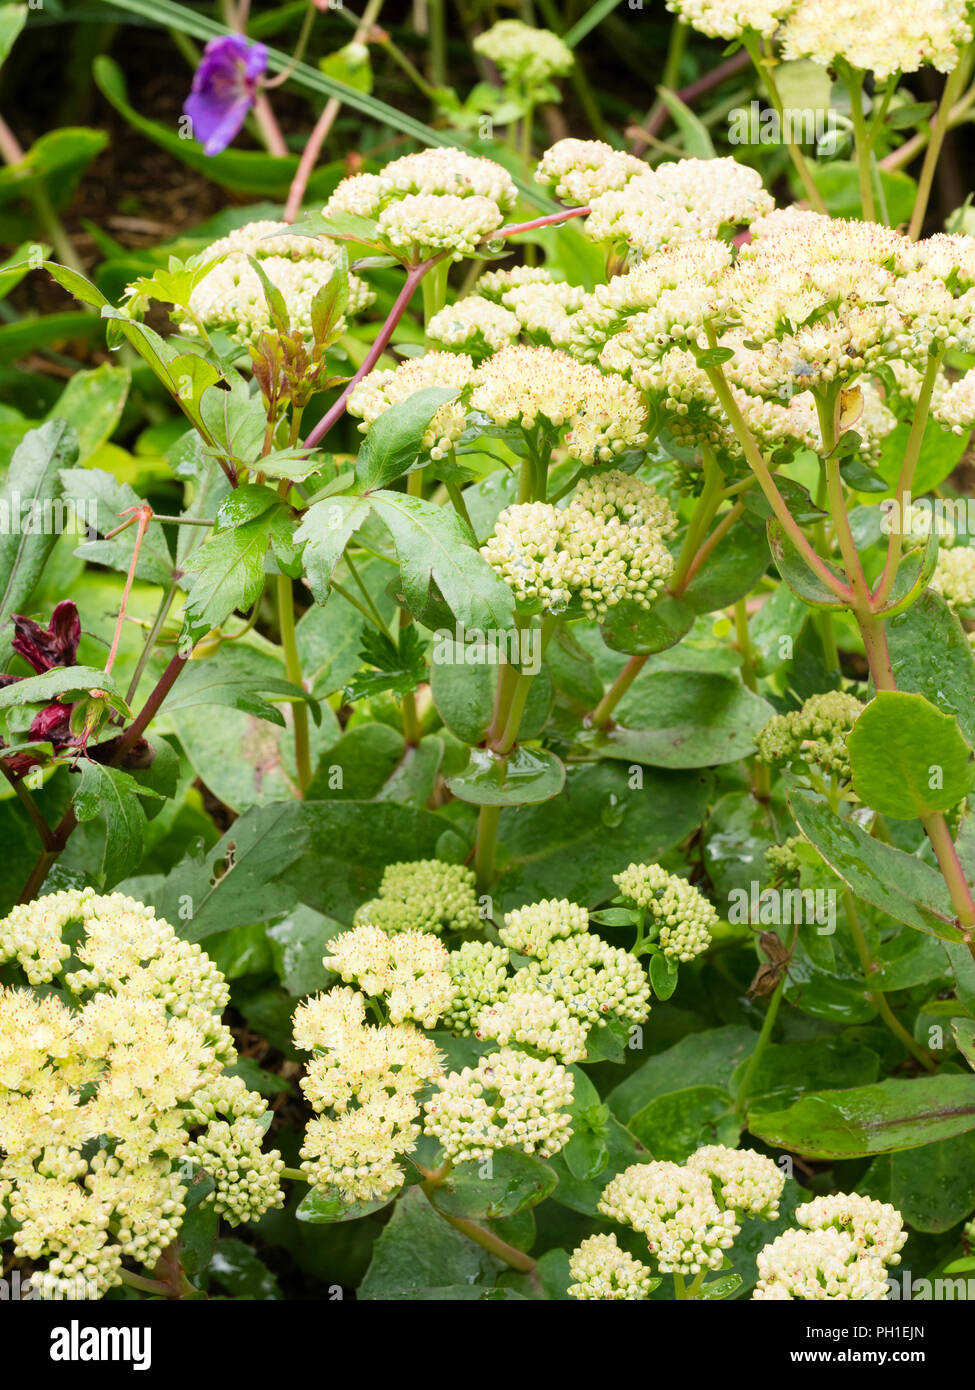 Pale, red tipped late summer flowers of the perennial Sedum, Hylotelephium telephium subsp. maximum 'Gooseberry Fool' - Stock Image